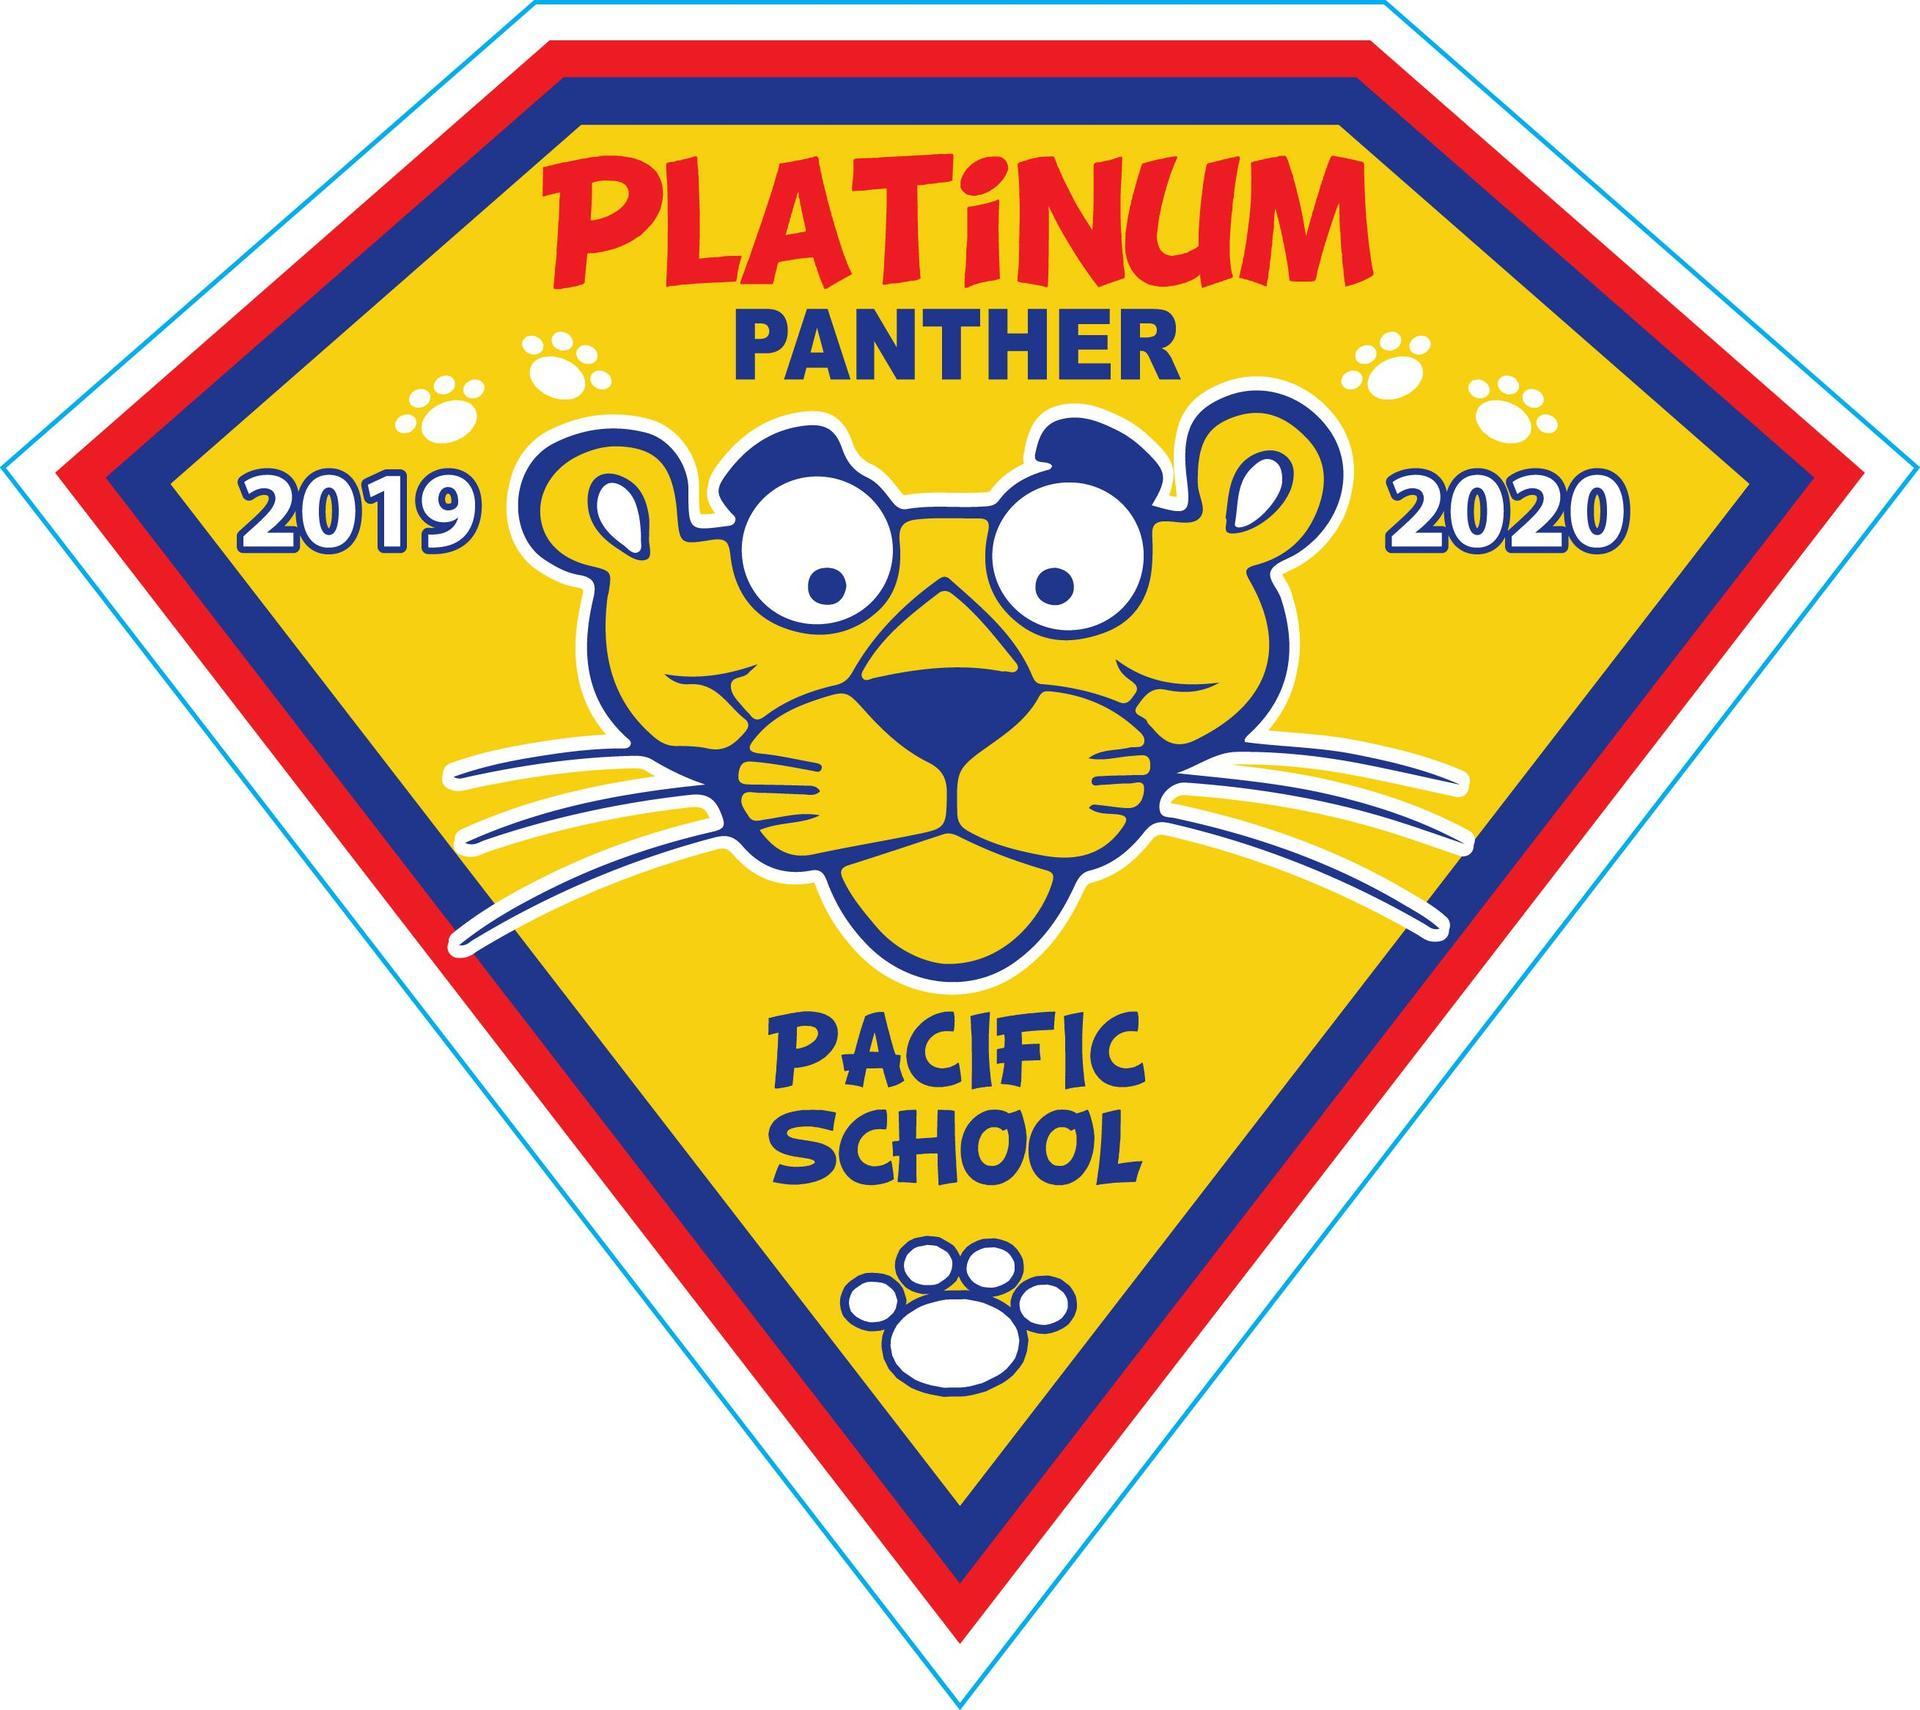 Platinum Panther Magnet